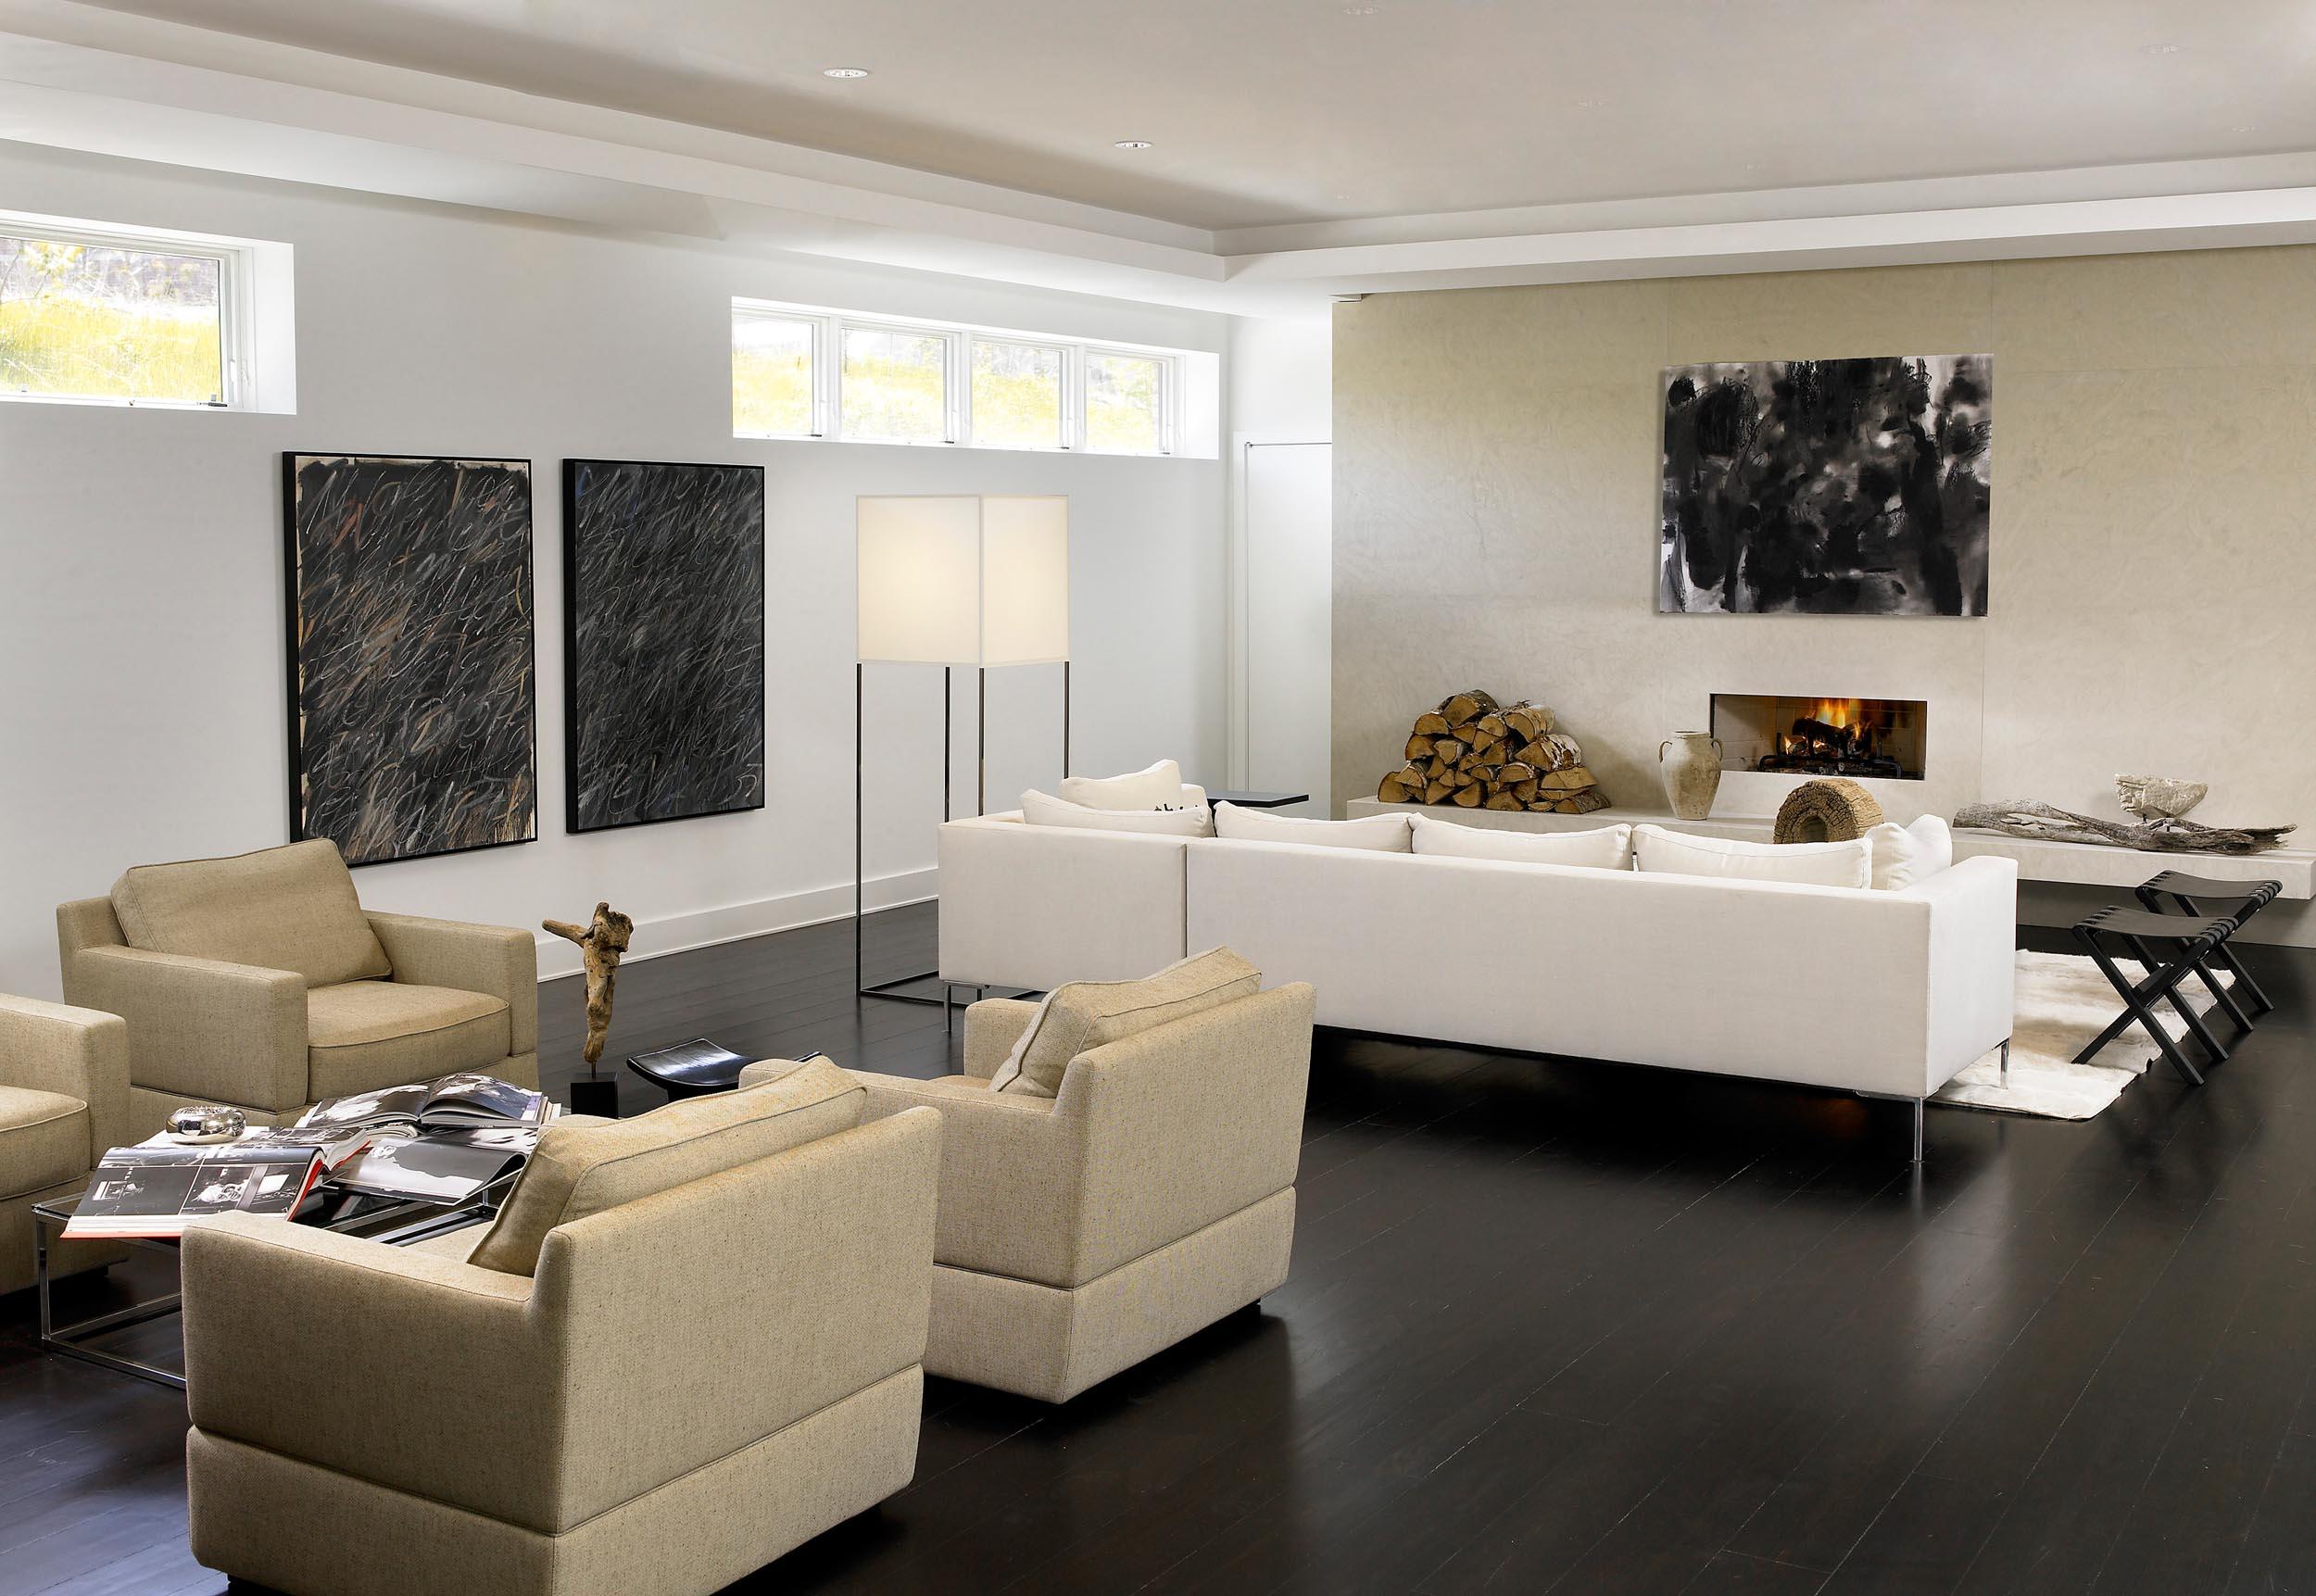 Leo_Designs_Chicago_interior_design_contemporary_inspired_nail_factory_conversion4.jpg